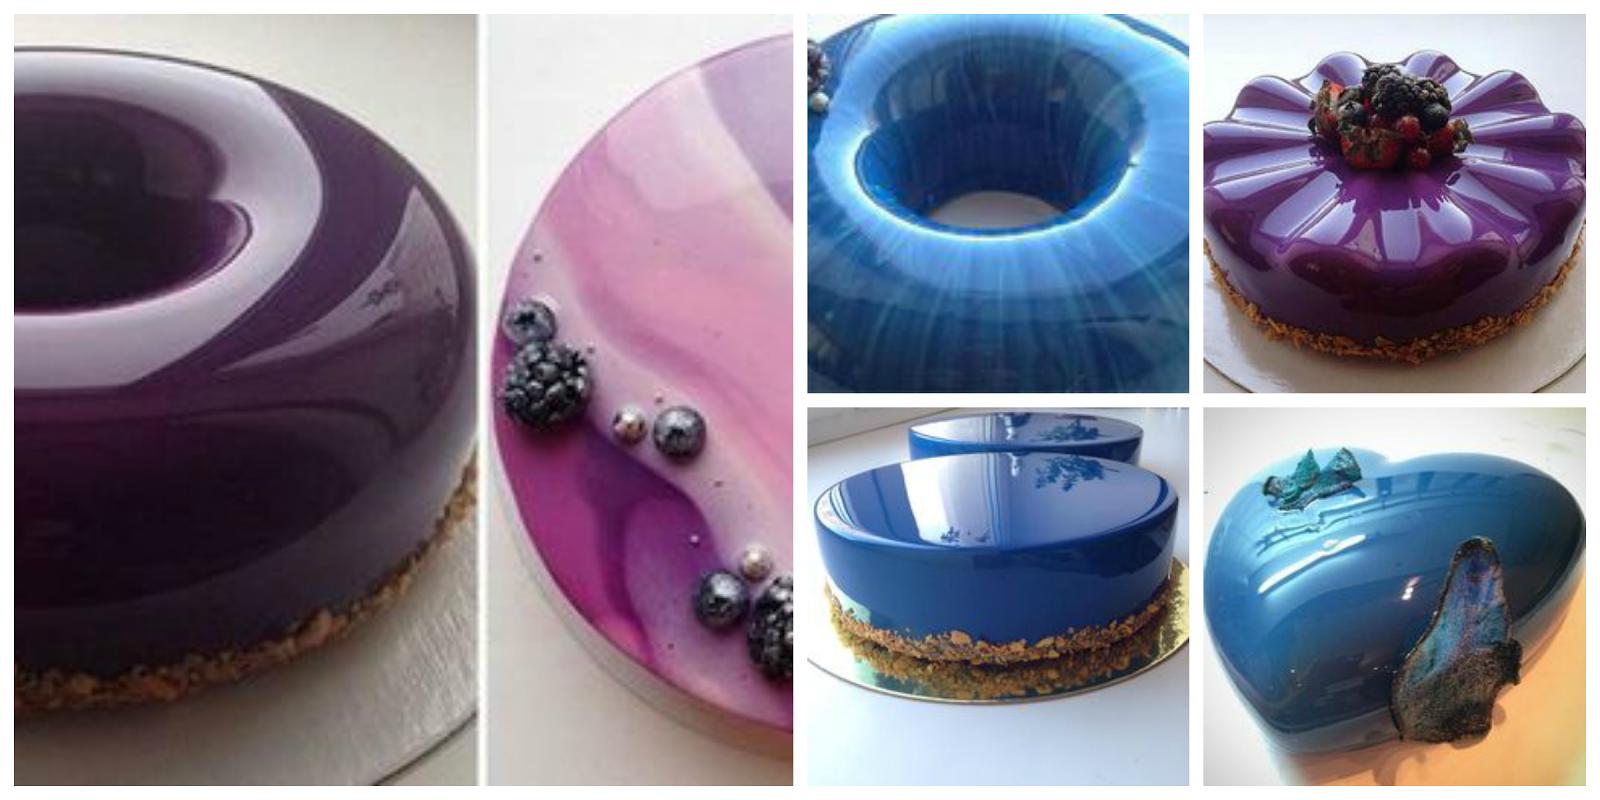 How To Make Glaze Icing For Angel Food Cake